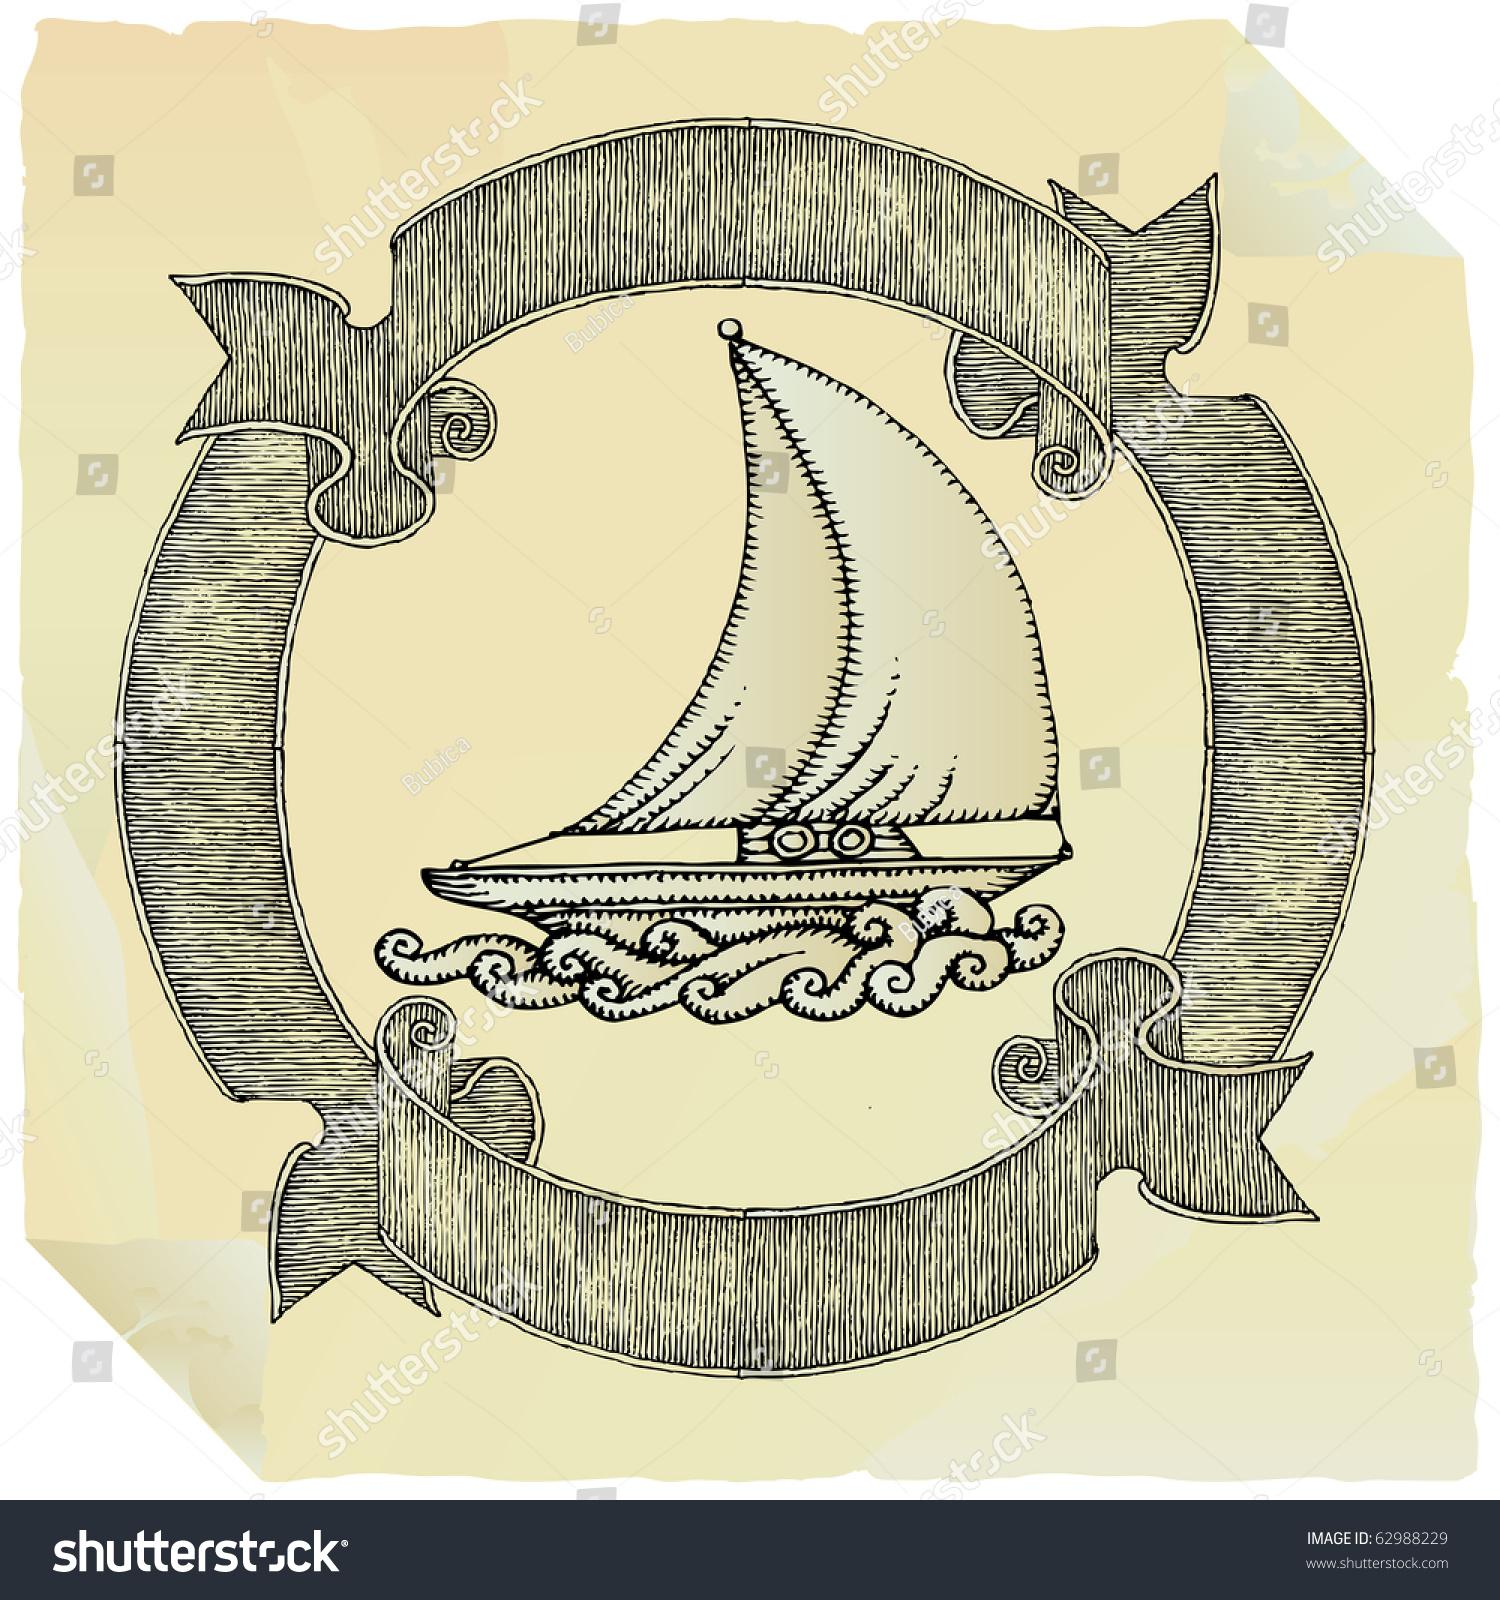 ship drawing paper - photo #35